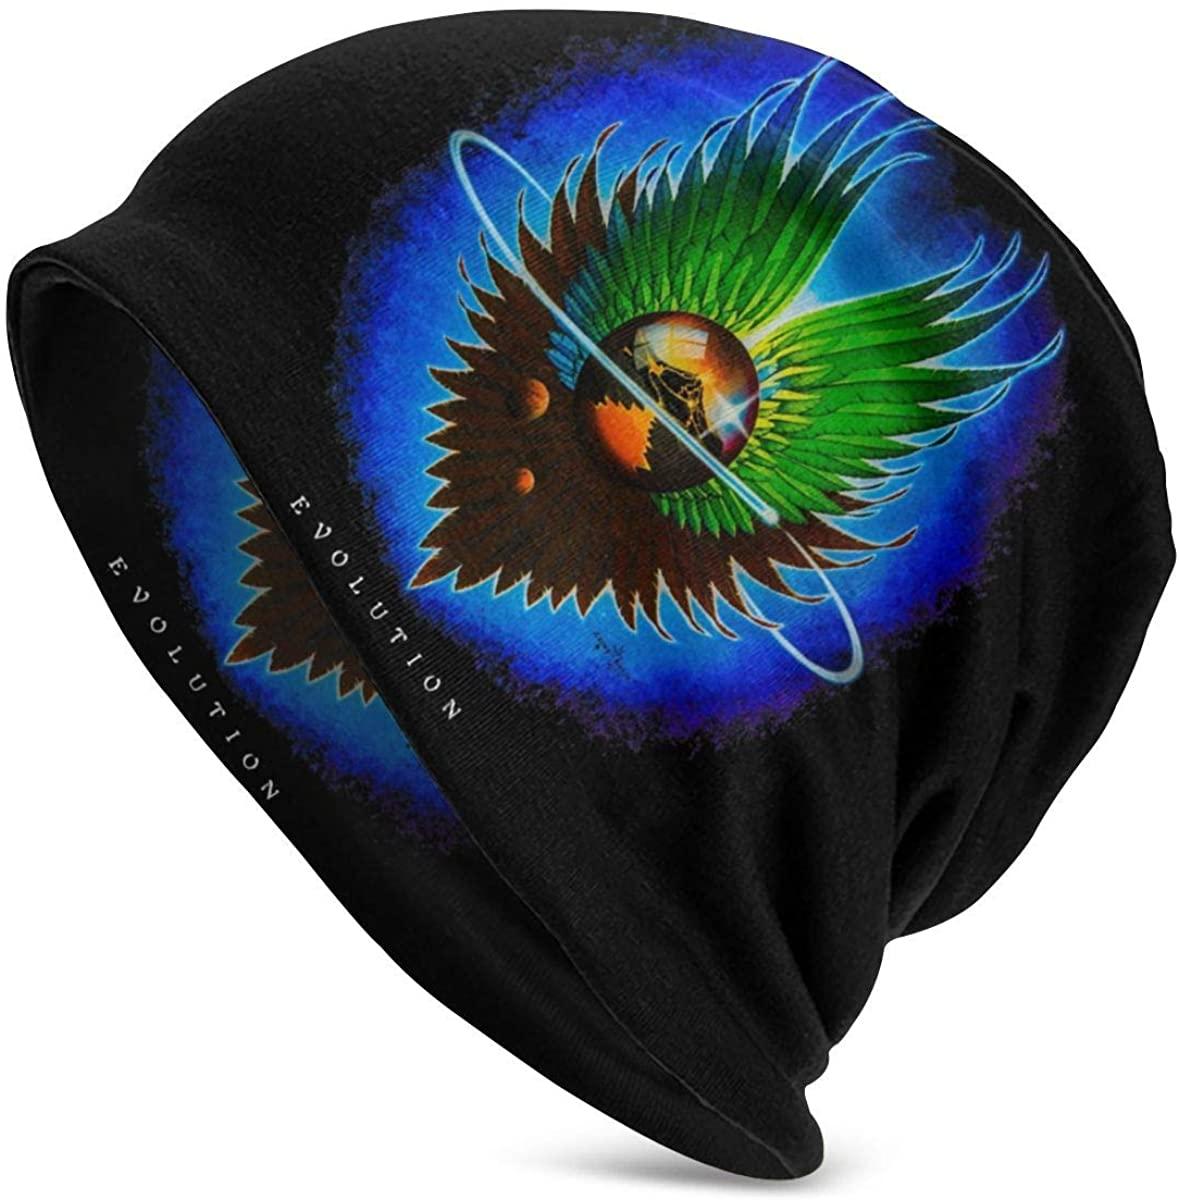 EME Steve Perry Unisex Adult Hedging Hat Beanie Cap Comfort Daily Beanie Hat Black